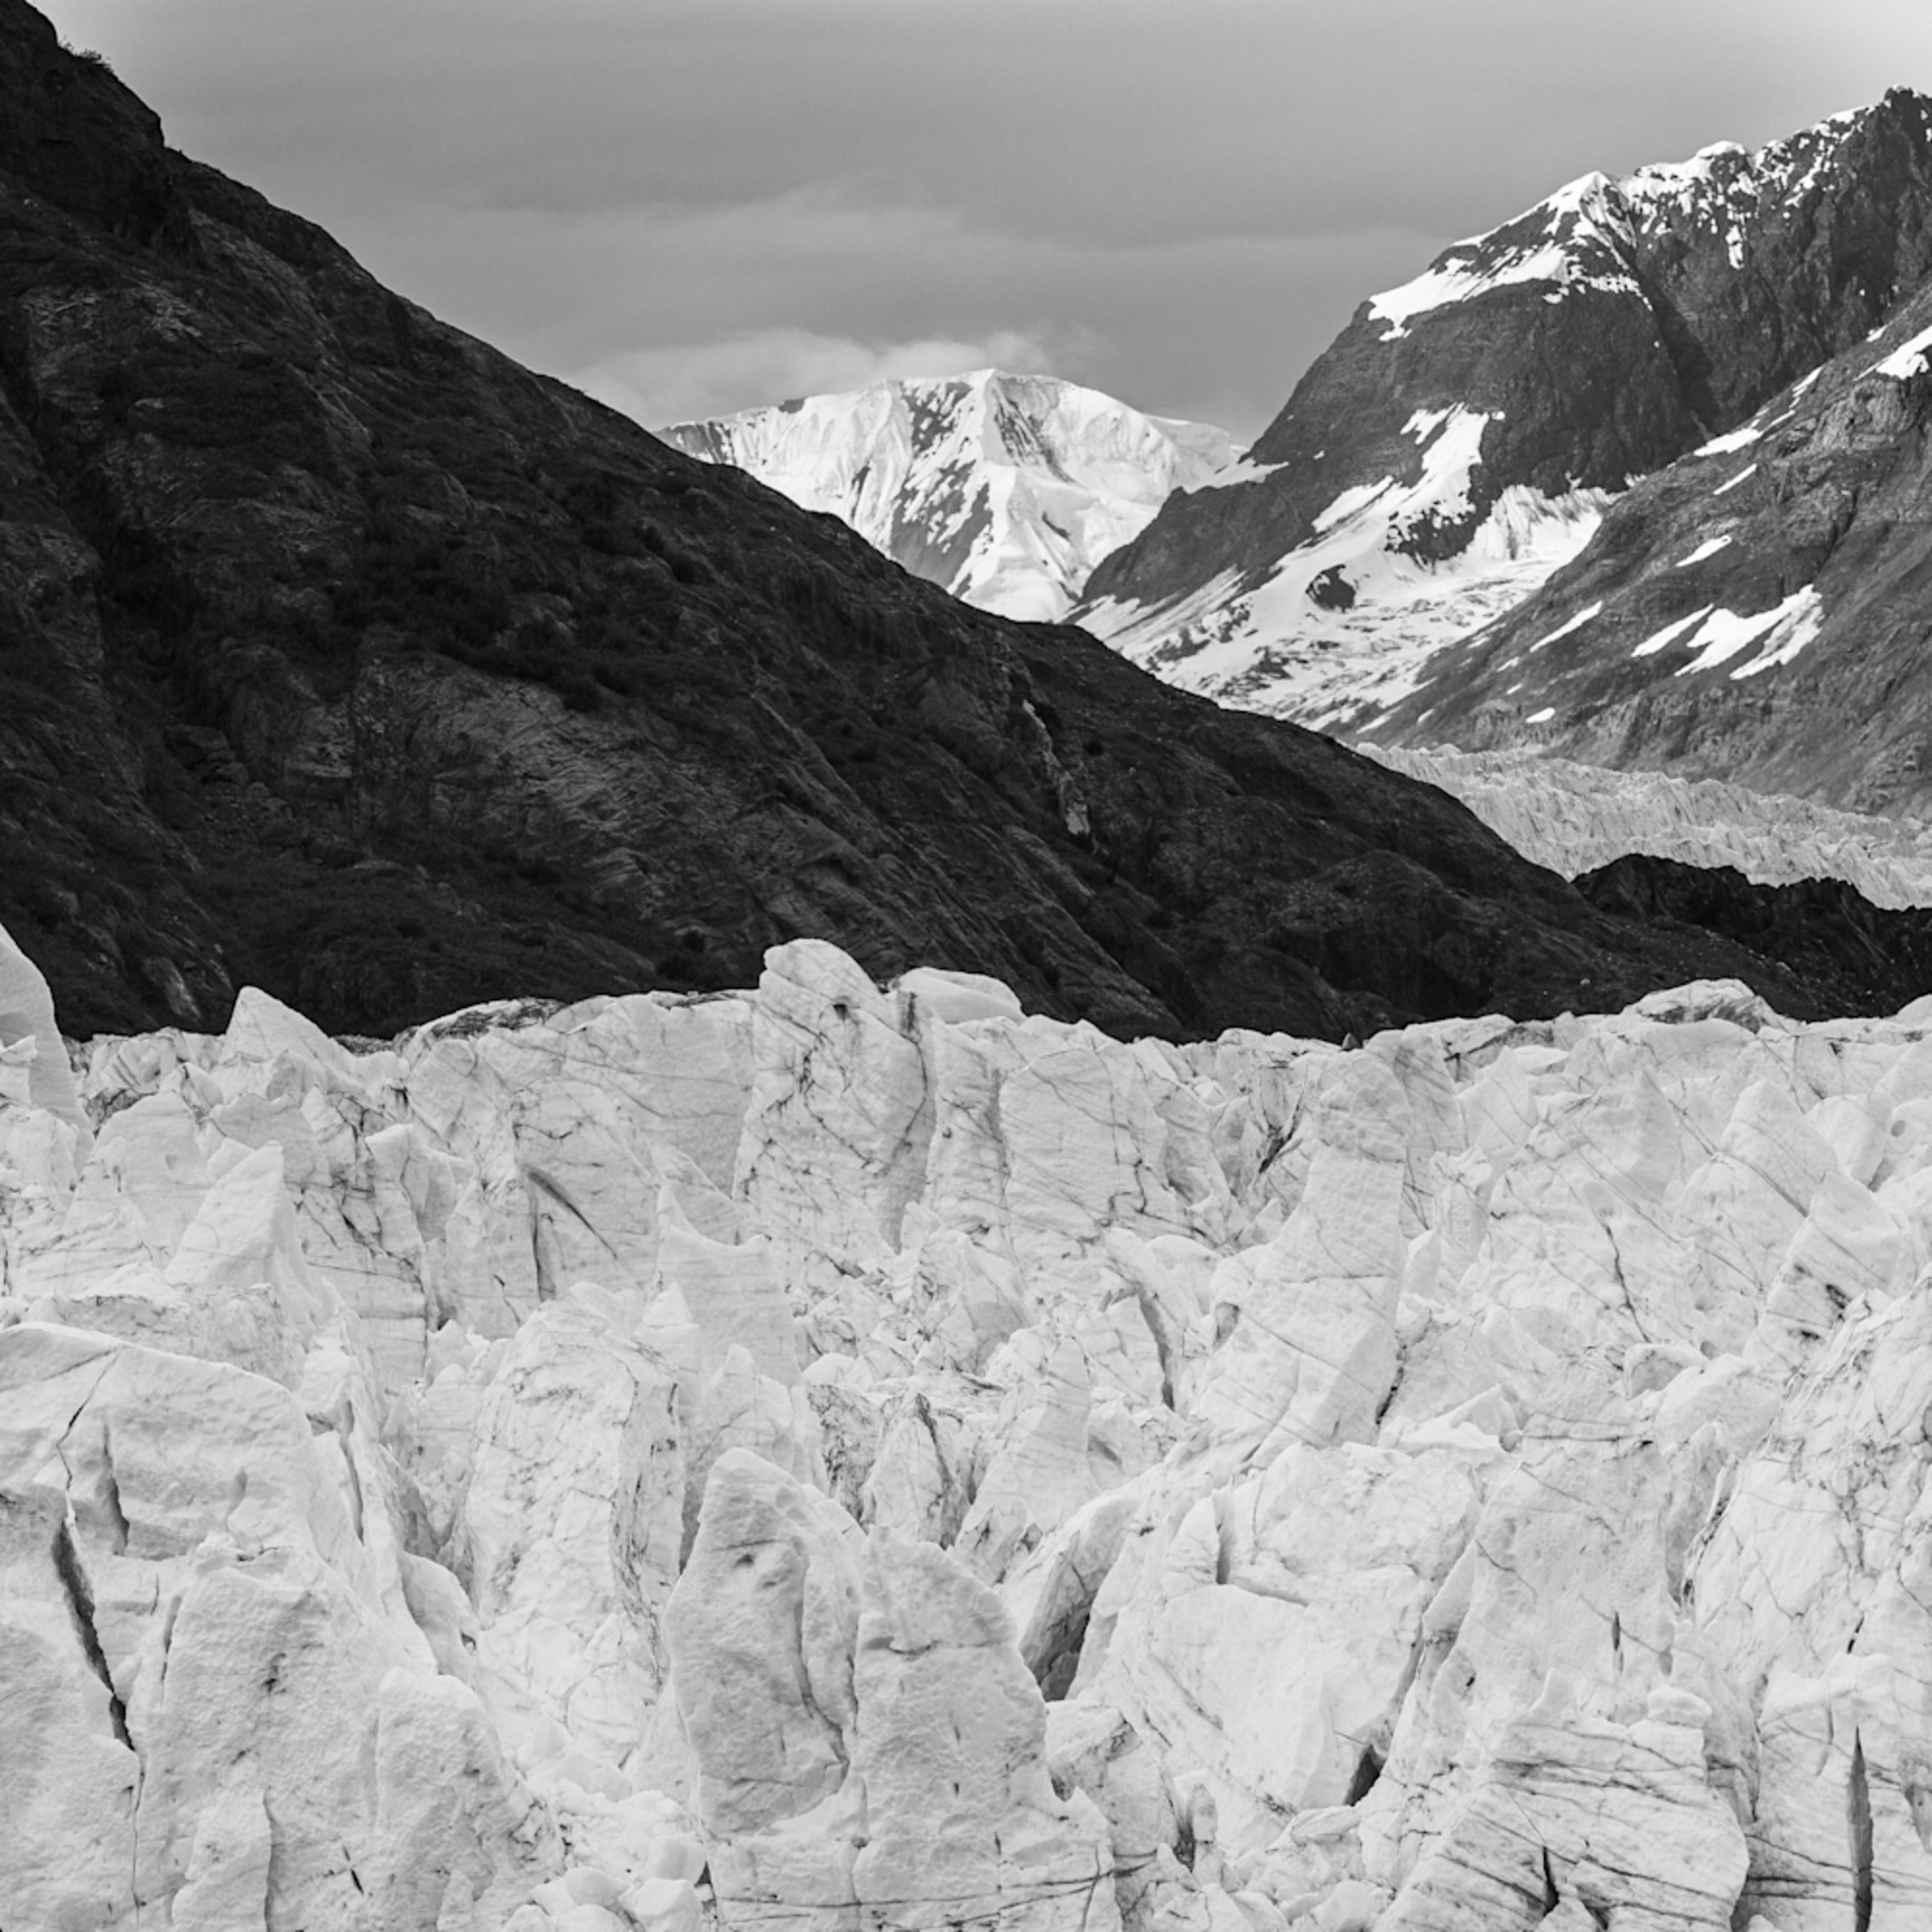 Glaciers and mountains alaska ked46k